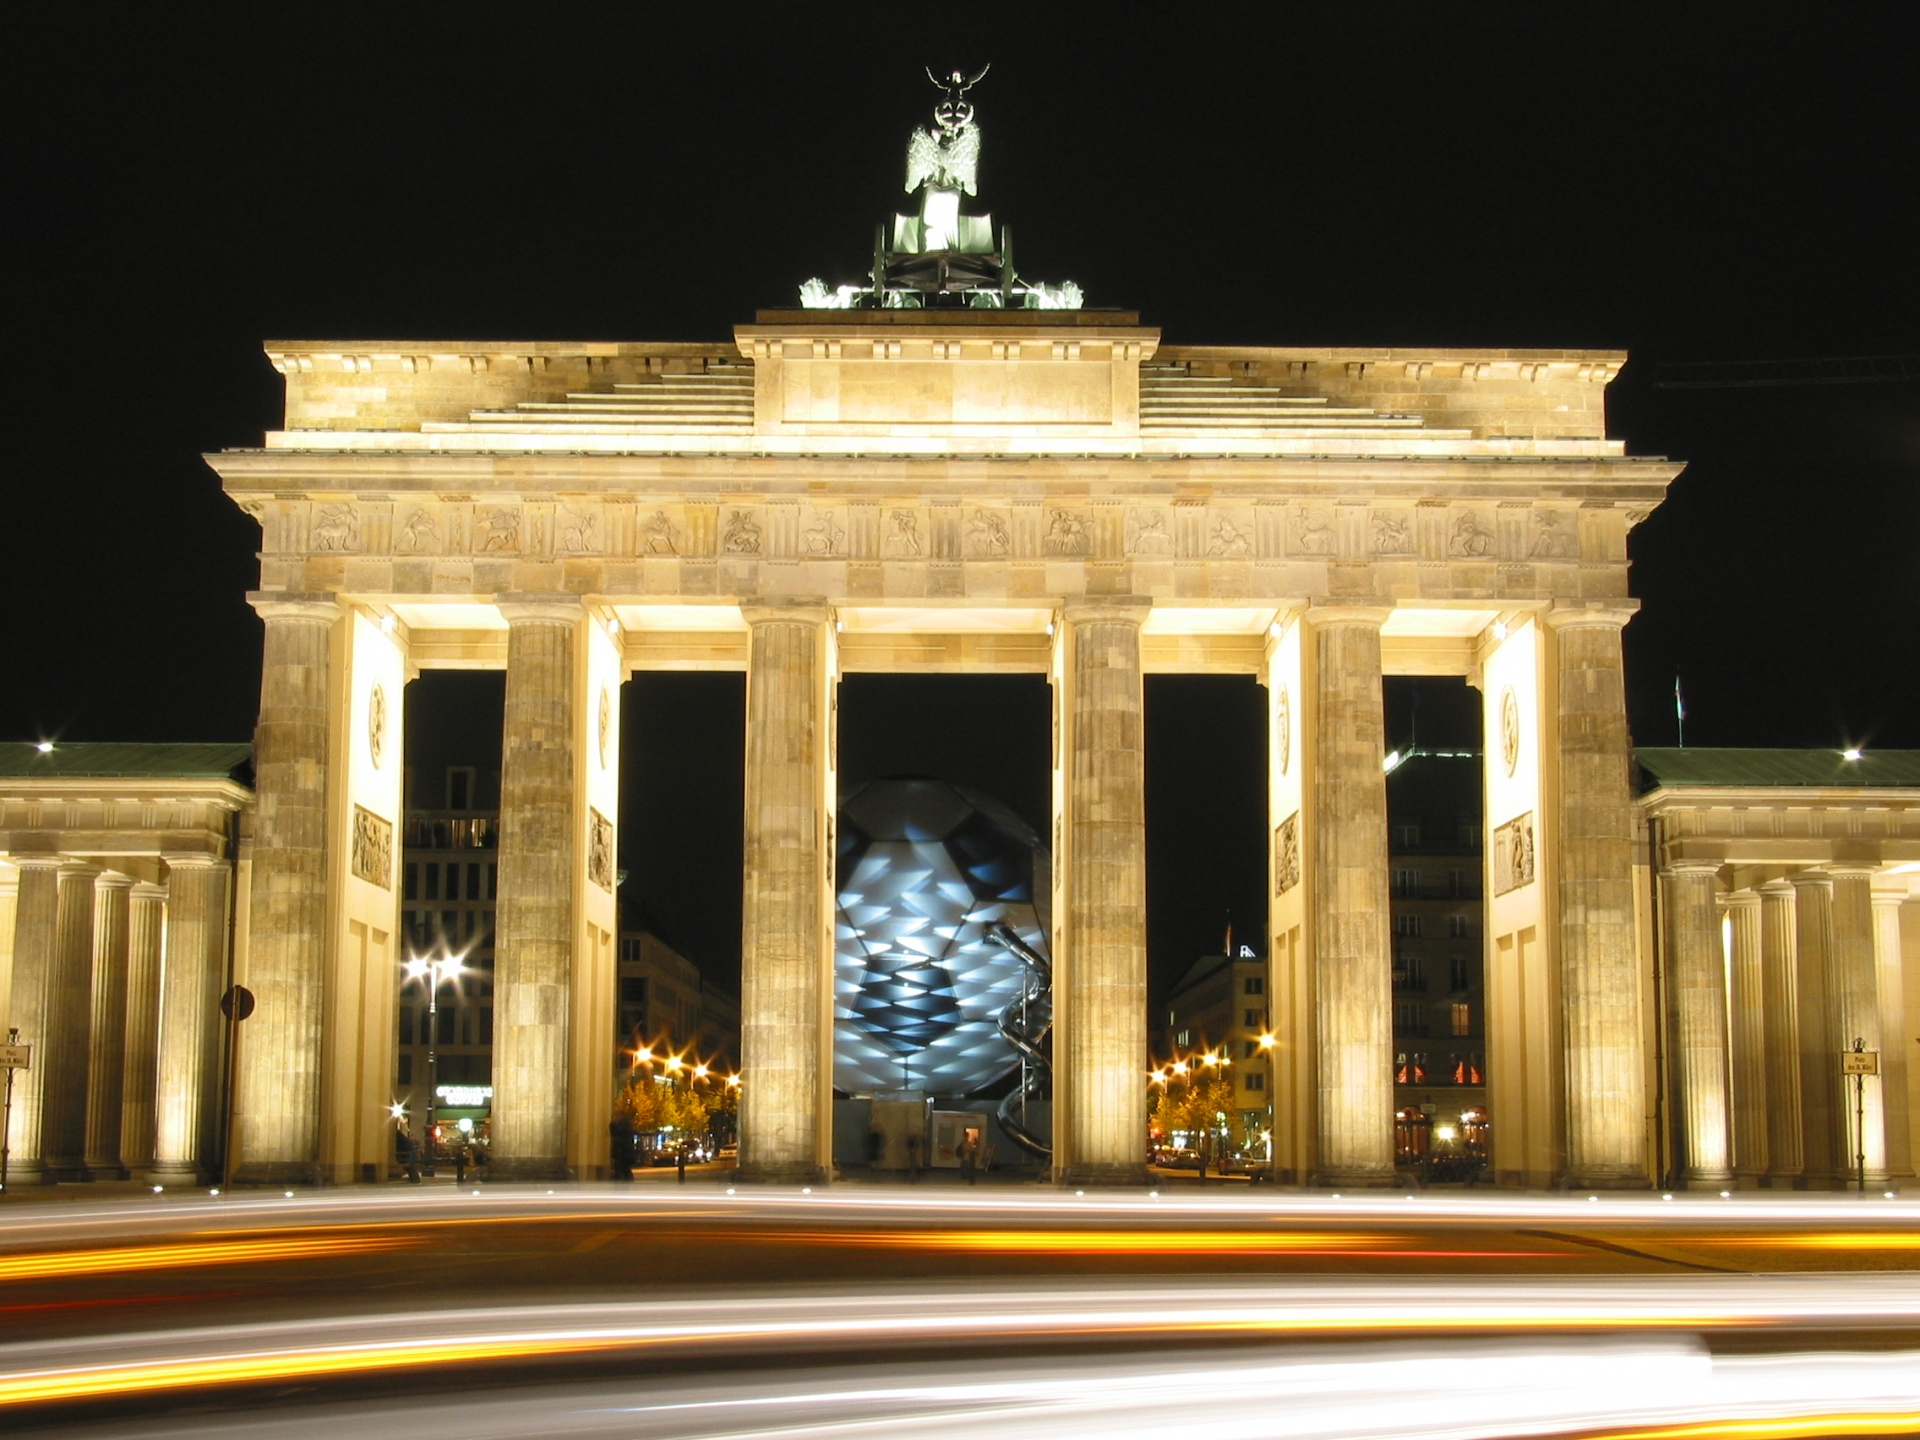 Brandenburg Gate Wallpaper 1920x1440 ID24553 1920x1440